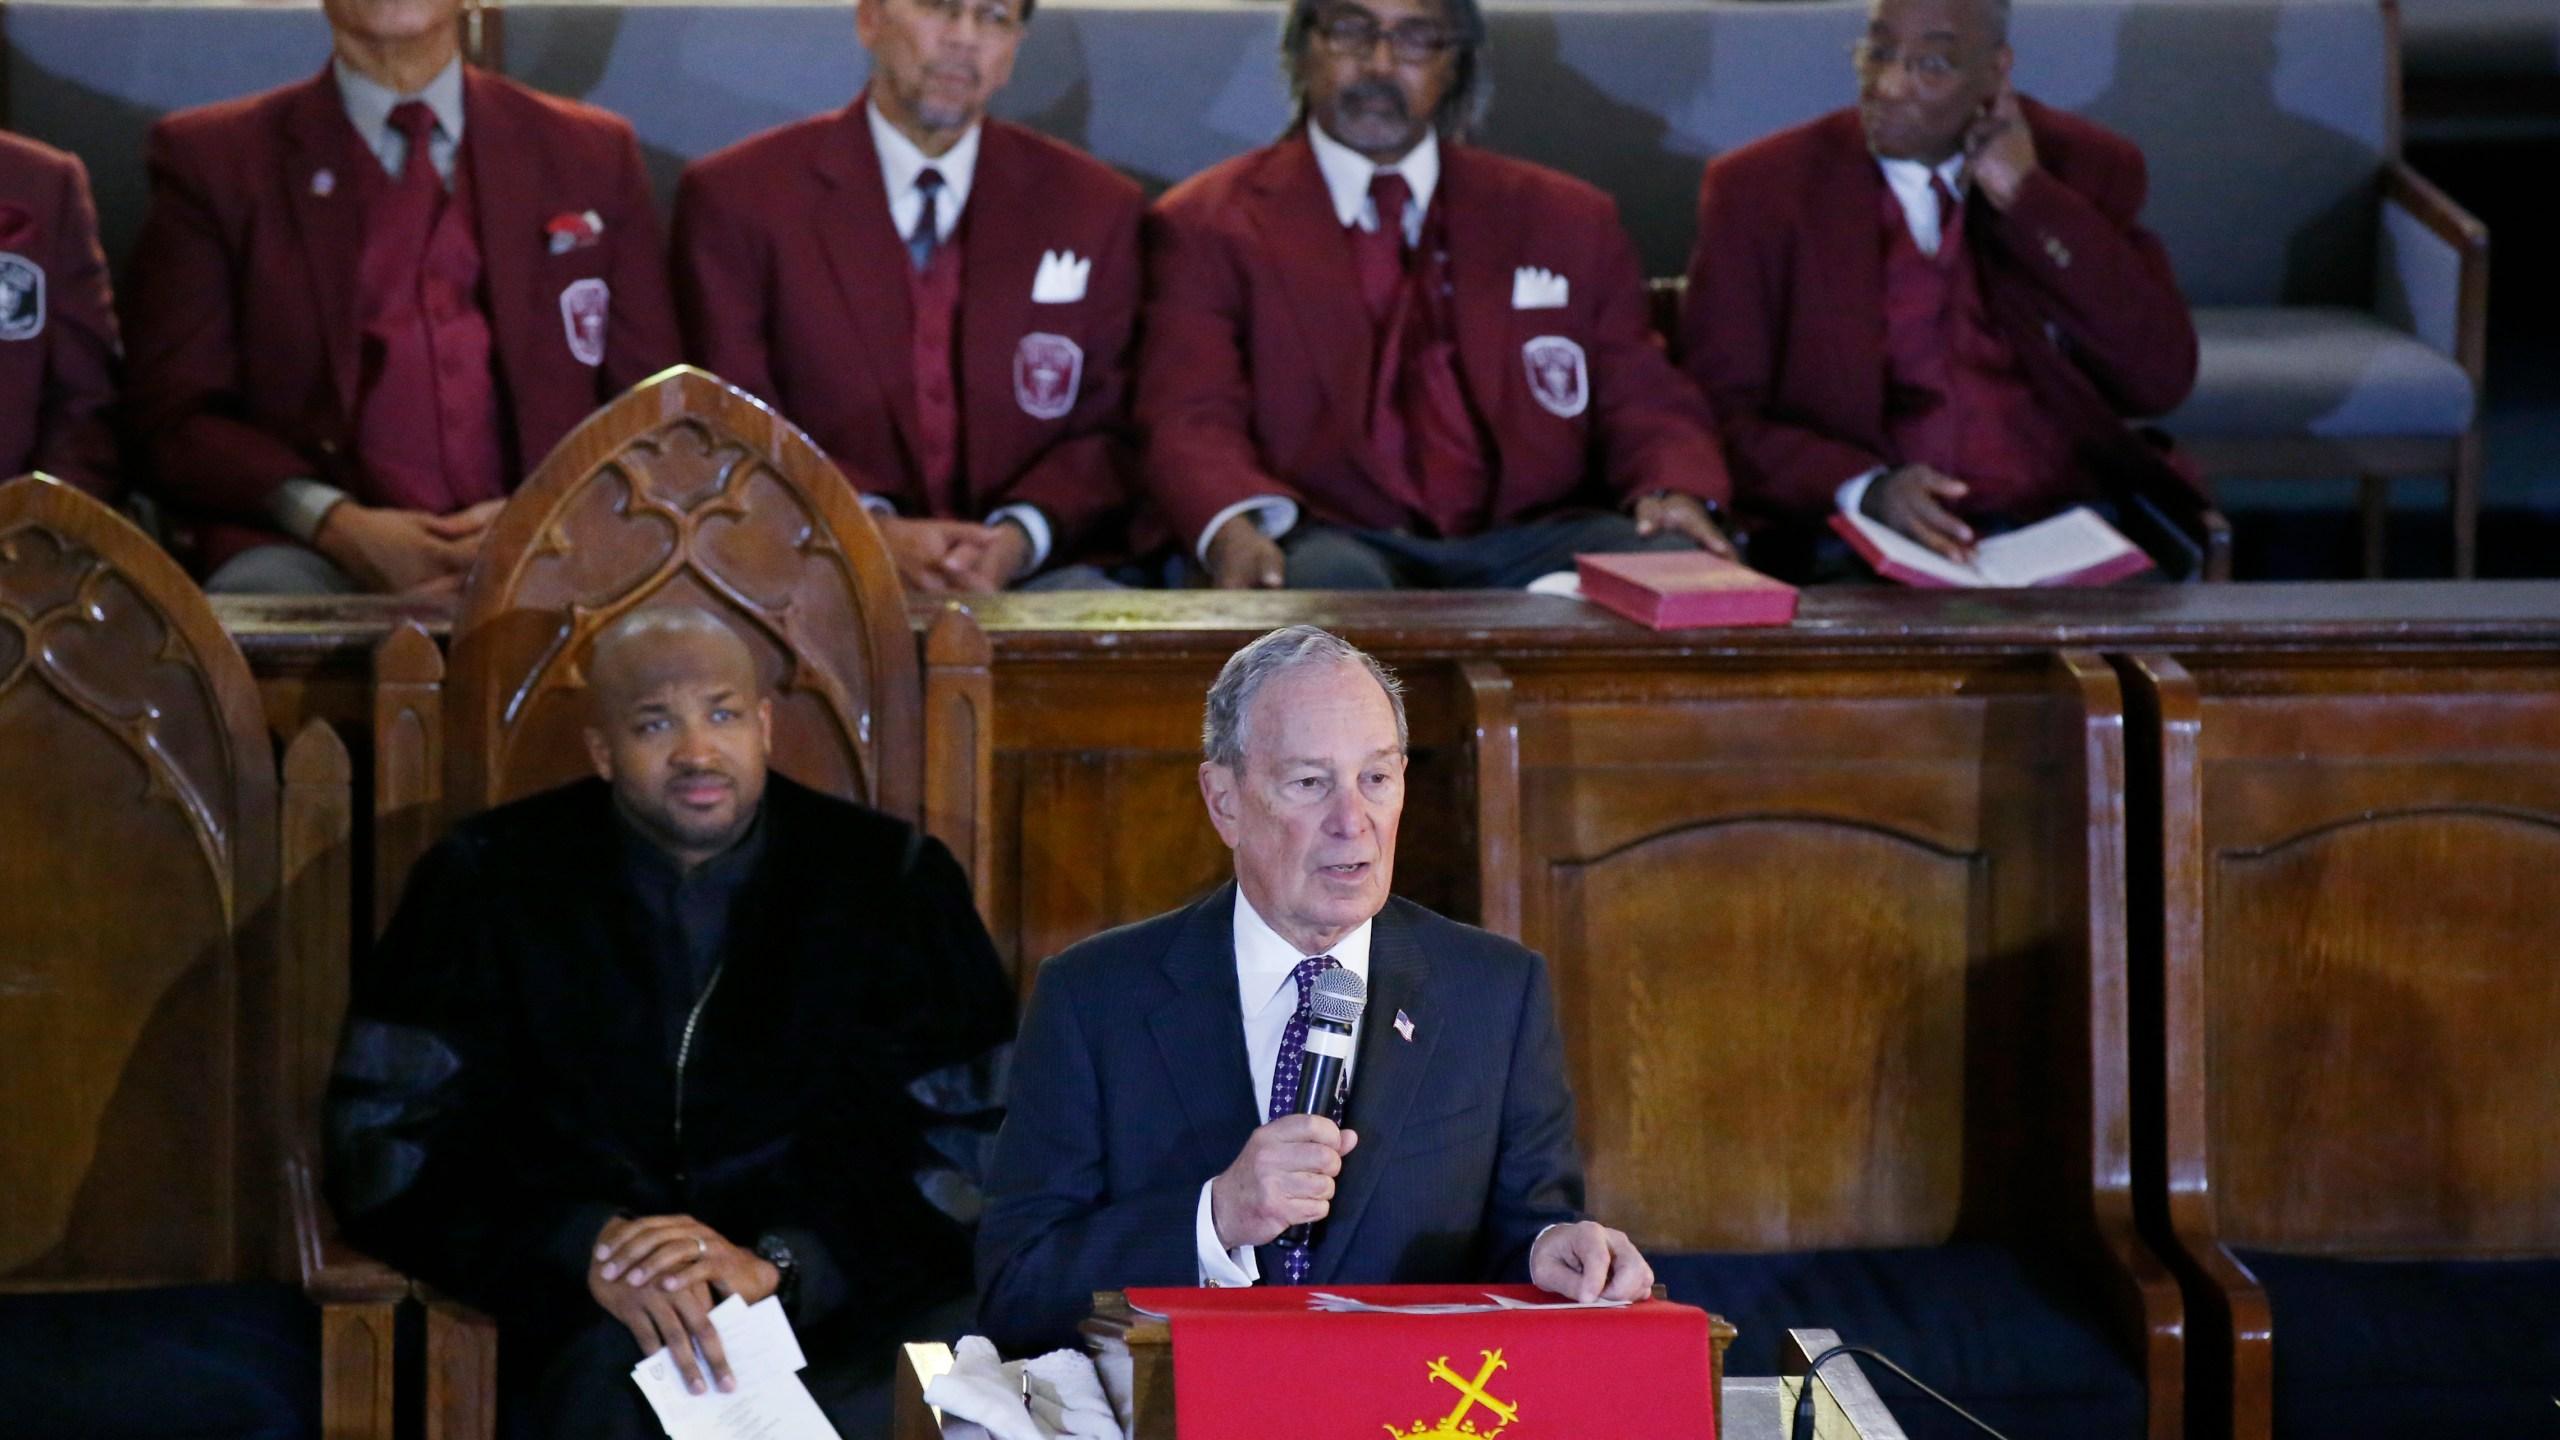 Michael Bloomberg, Robert Turner